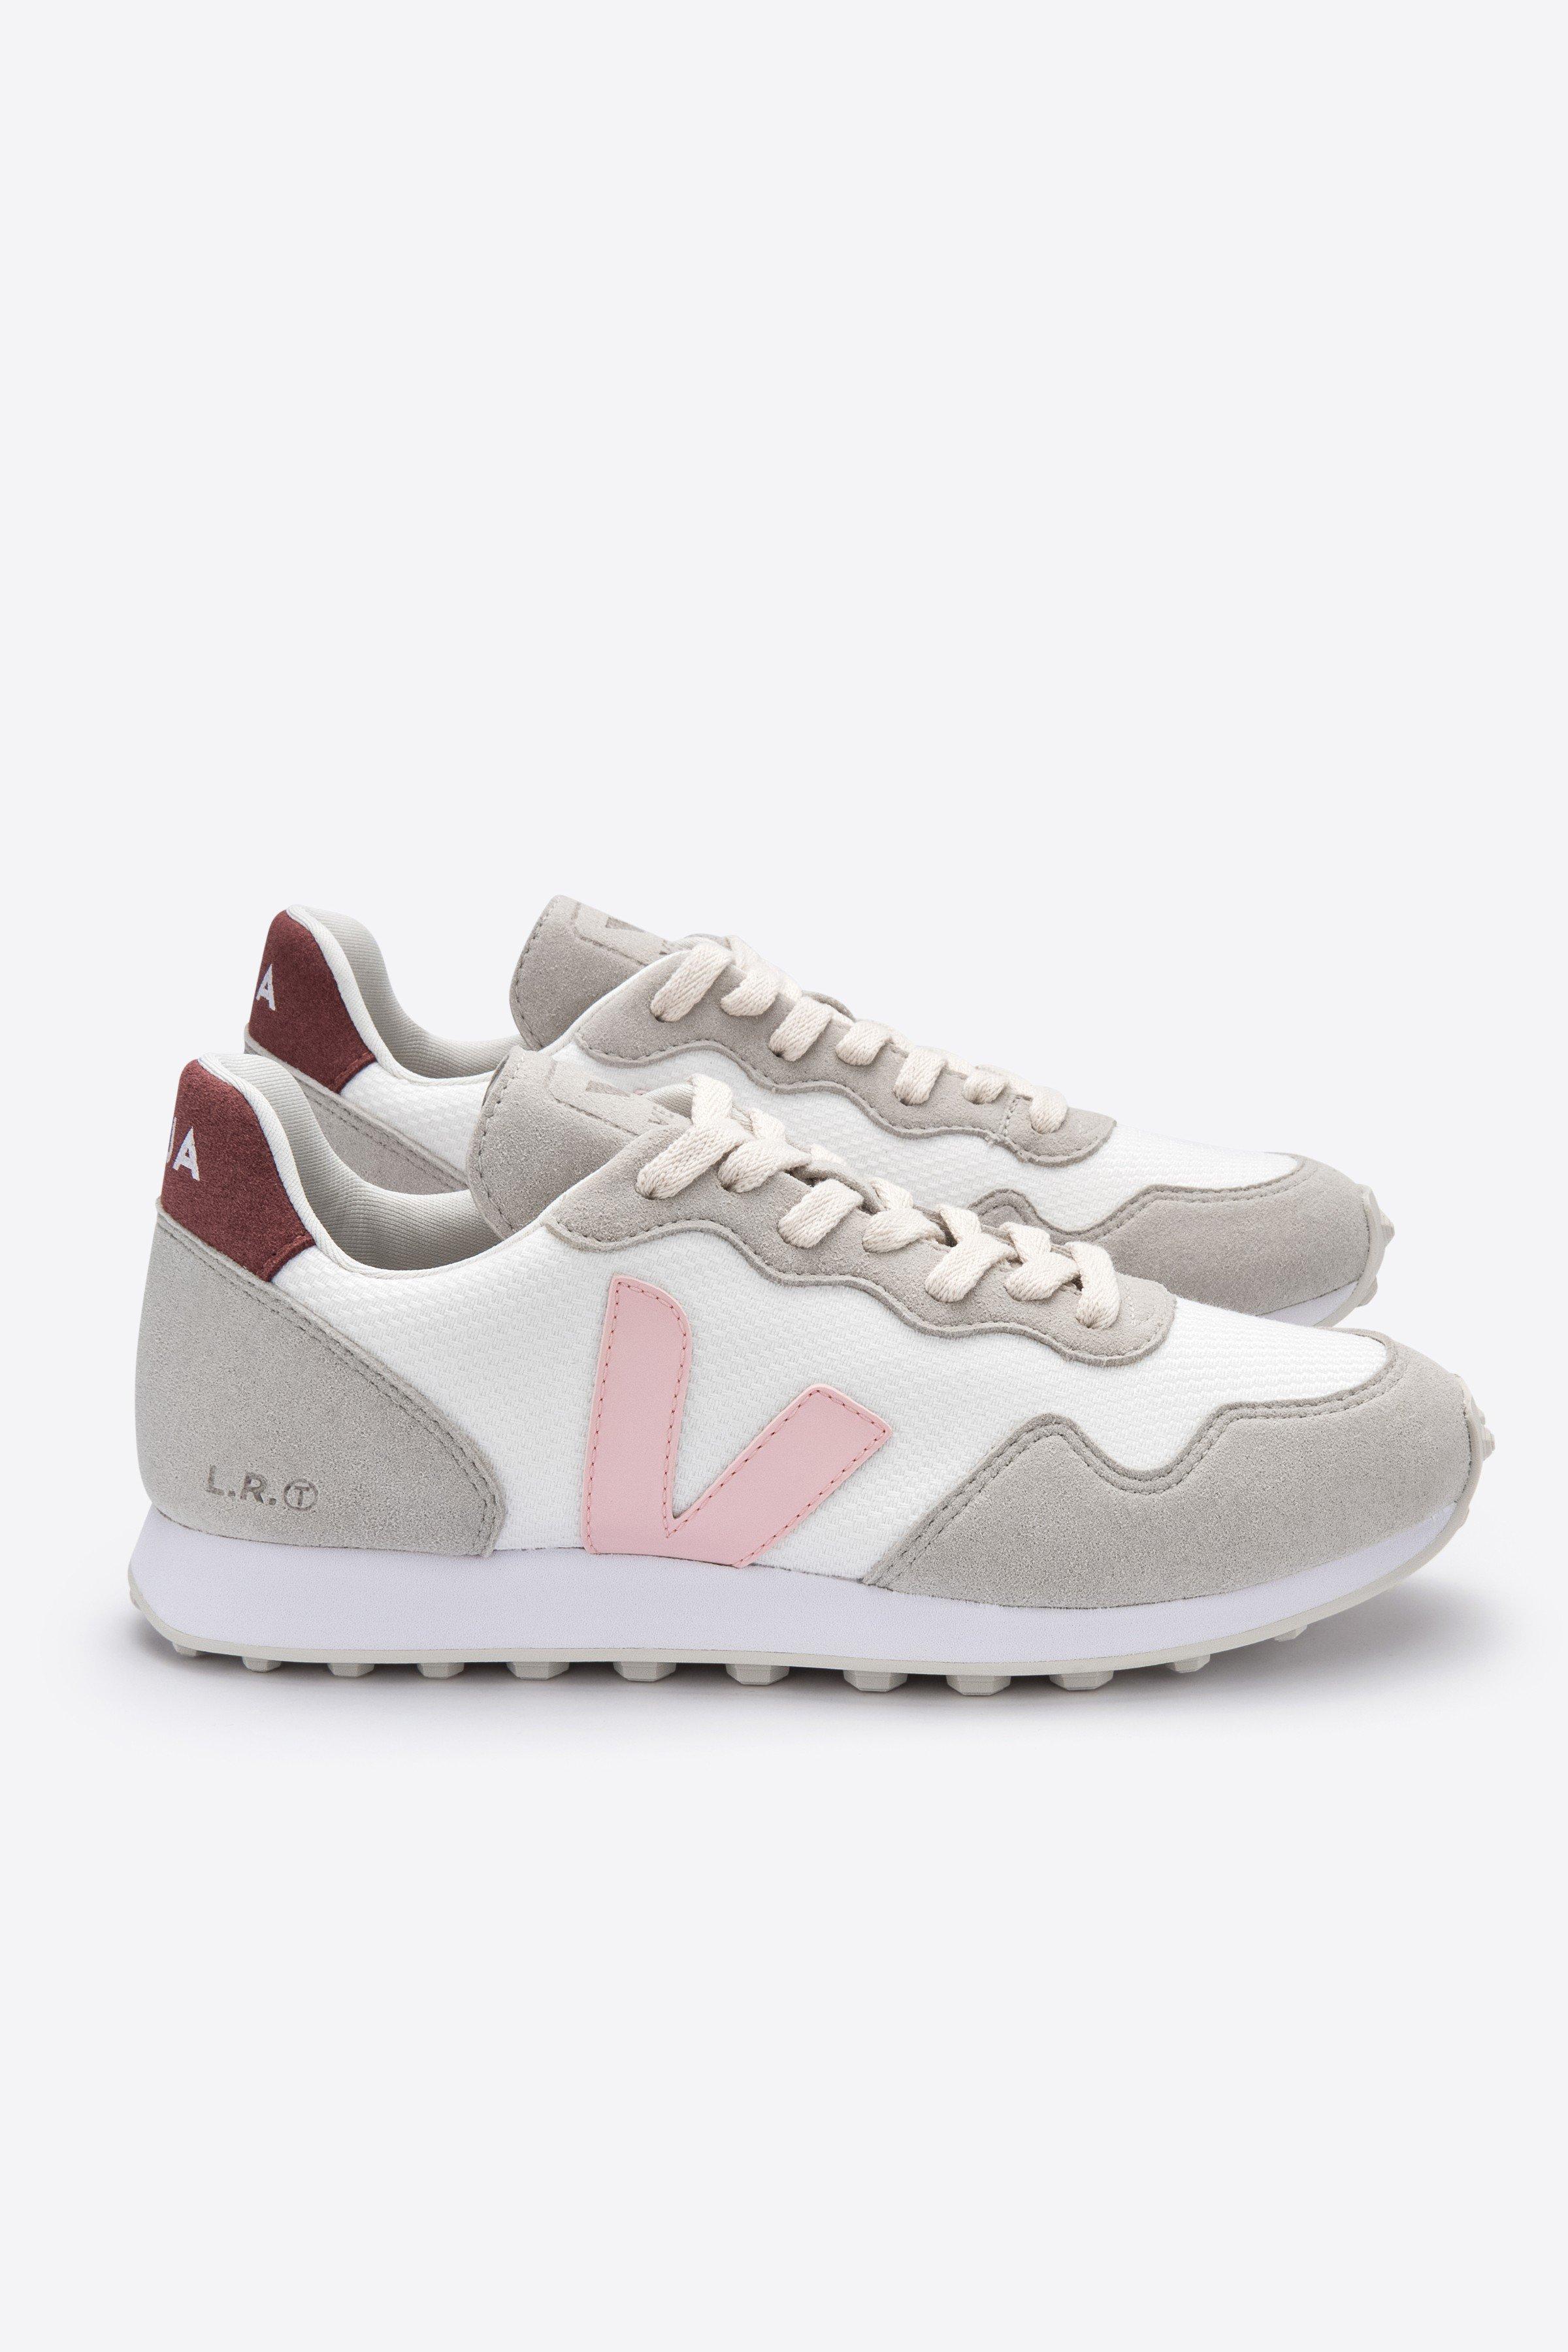 Veja Sneaker Sdu Hexa White Petale Dried P | LOVECO